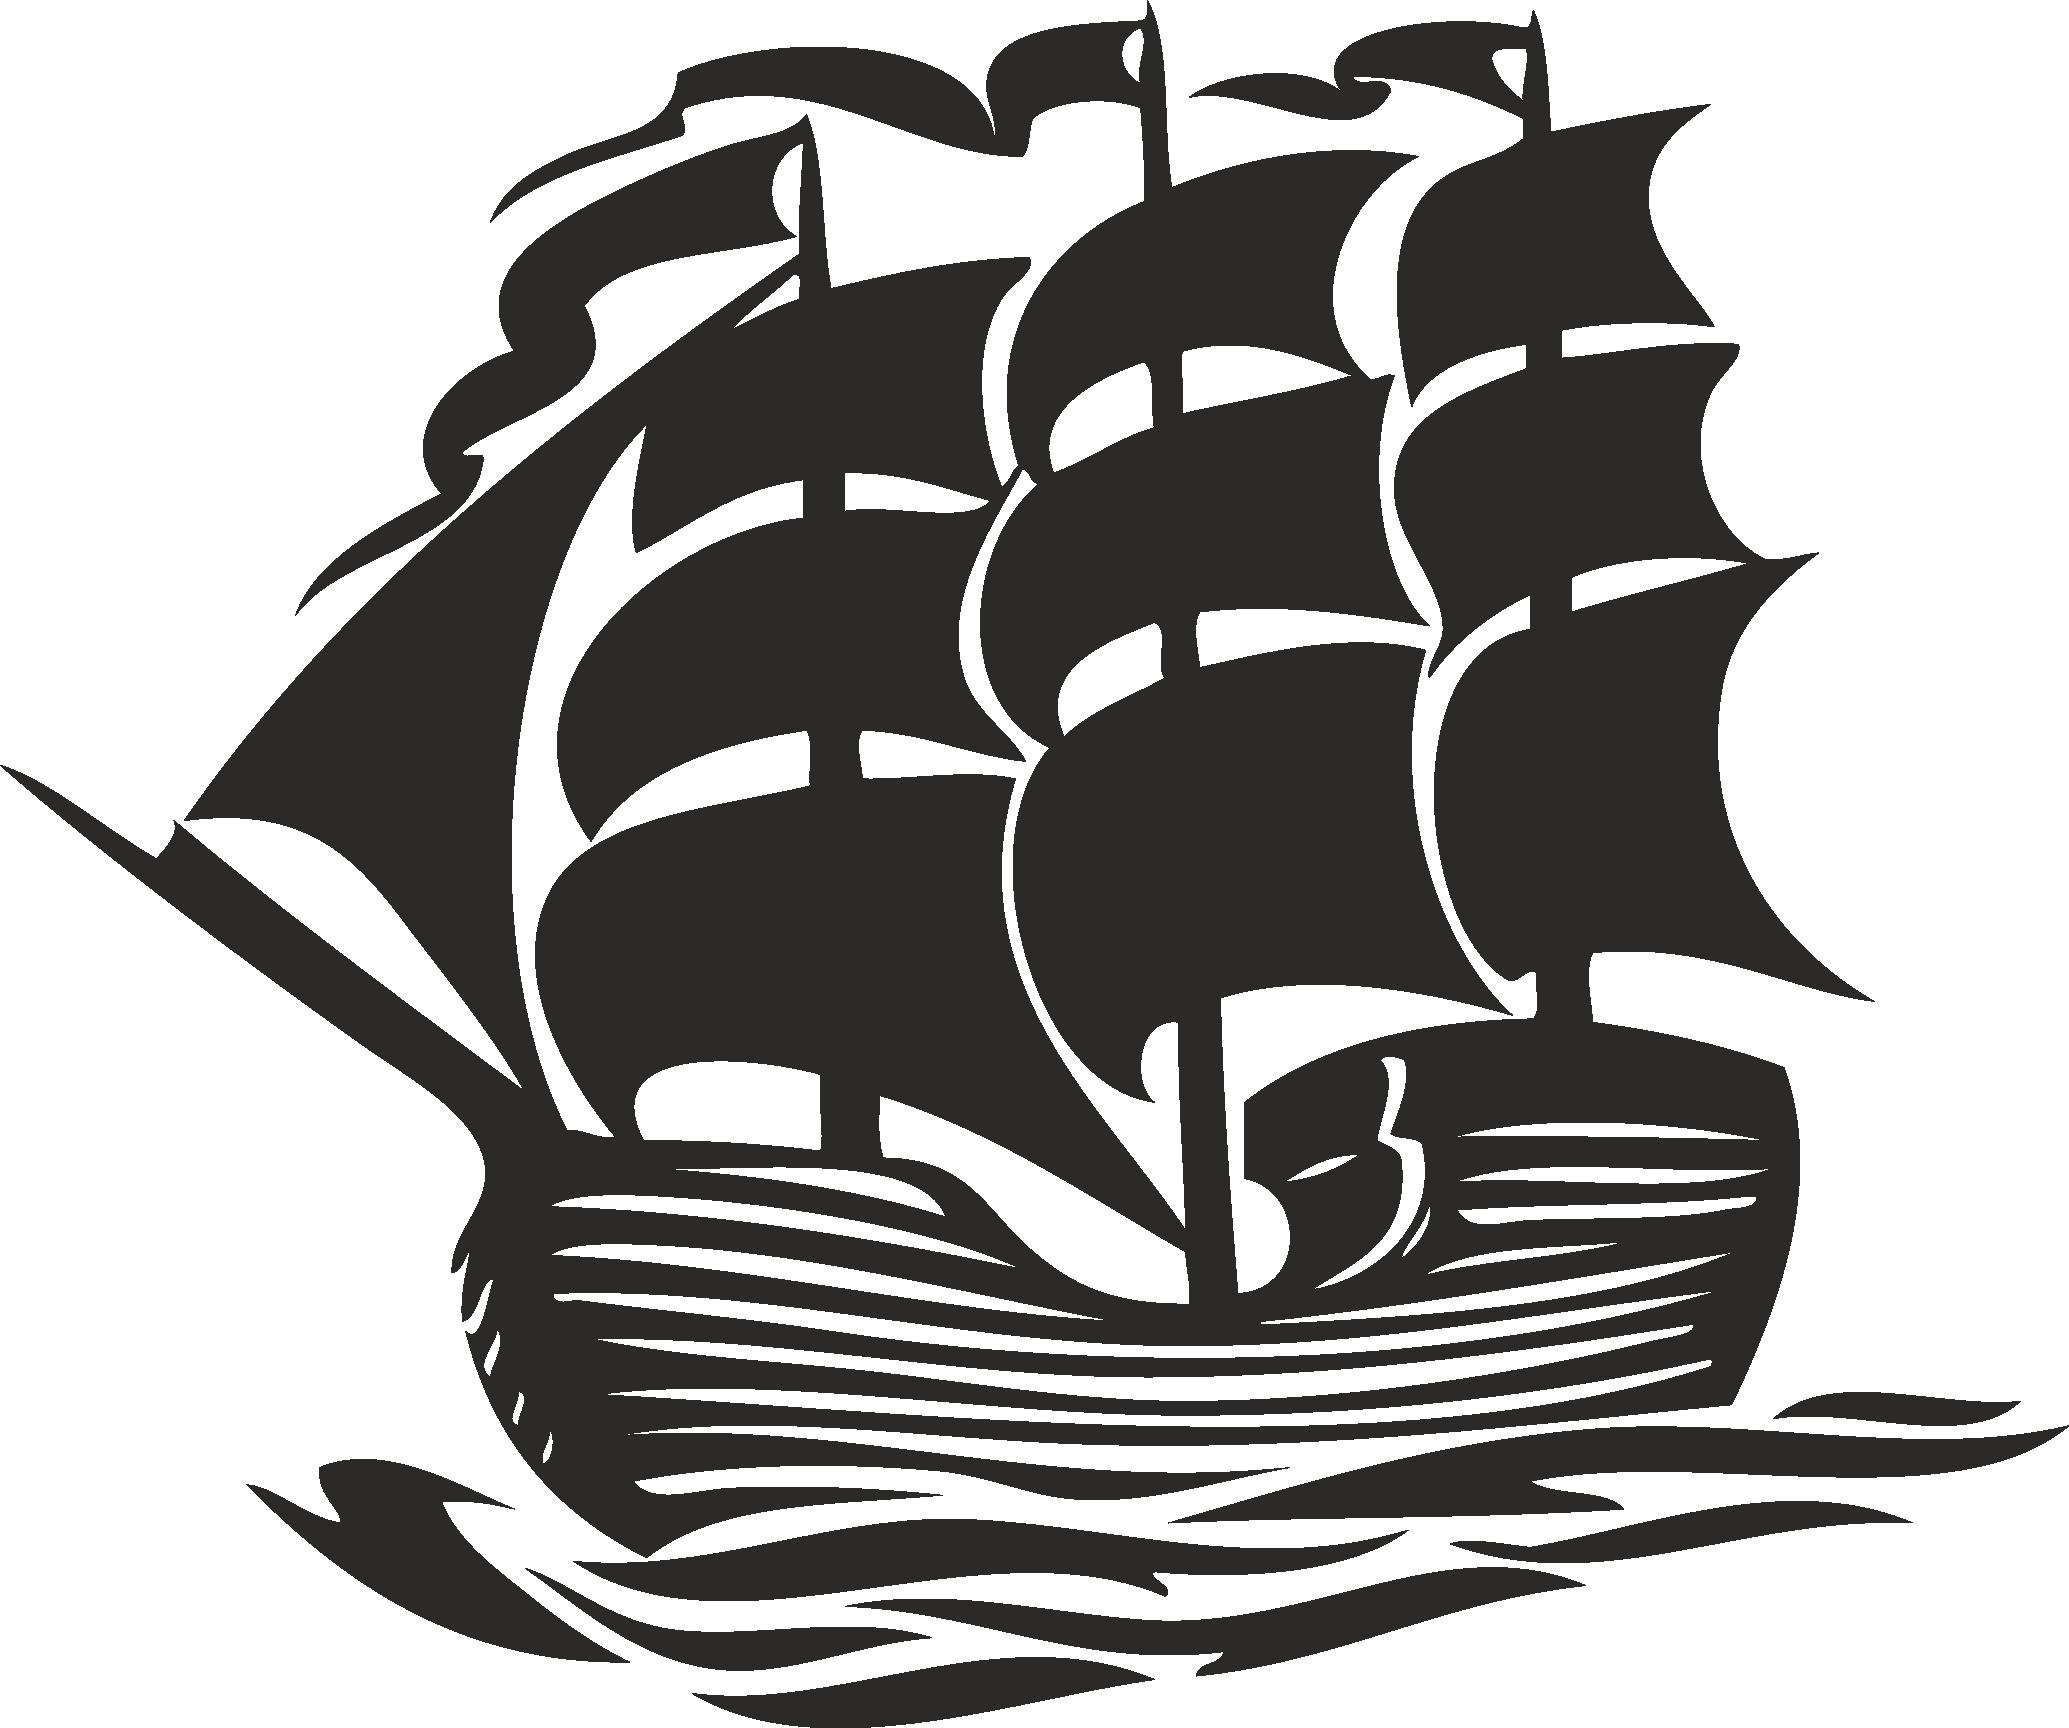 Sailboat Beautiful Silhouettes Of Sailing Ships 09 Free DXF File